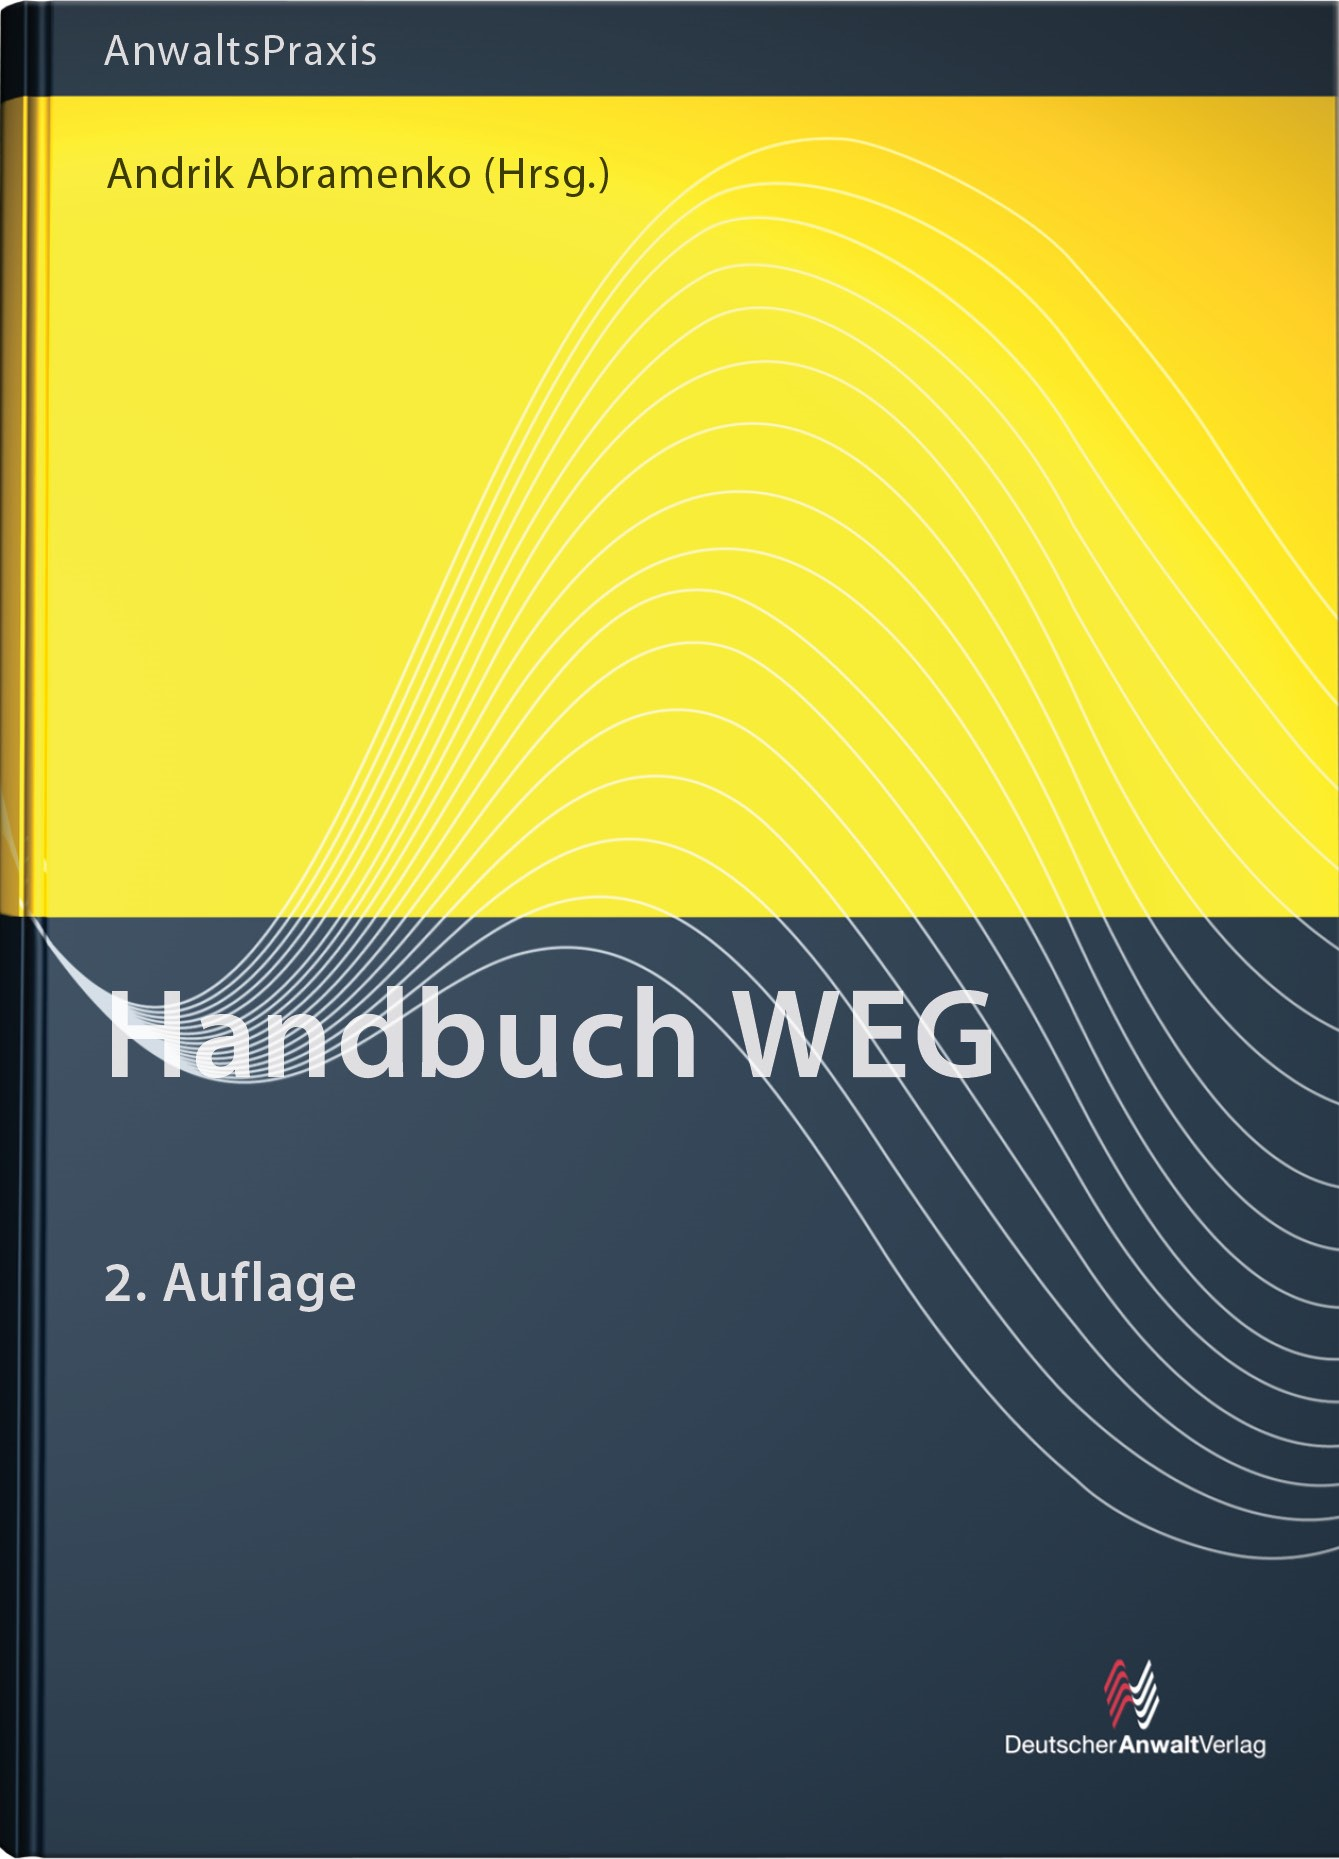 Handbuch WEG | Abramenko (Hrsg.) | 2. Auflage, 2013 | Buch (Cover)